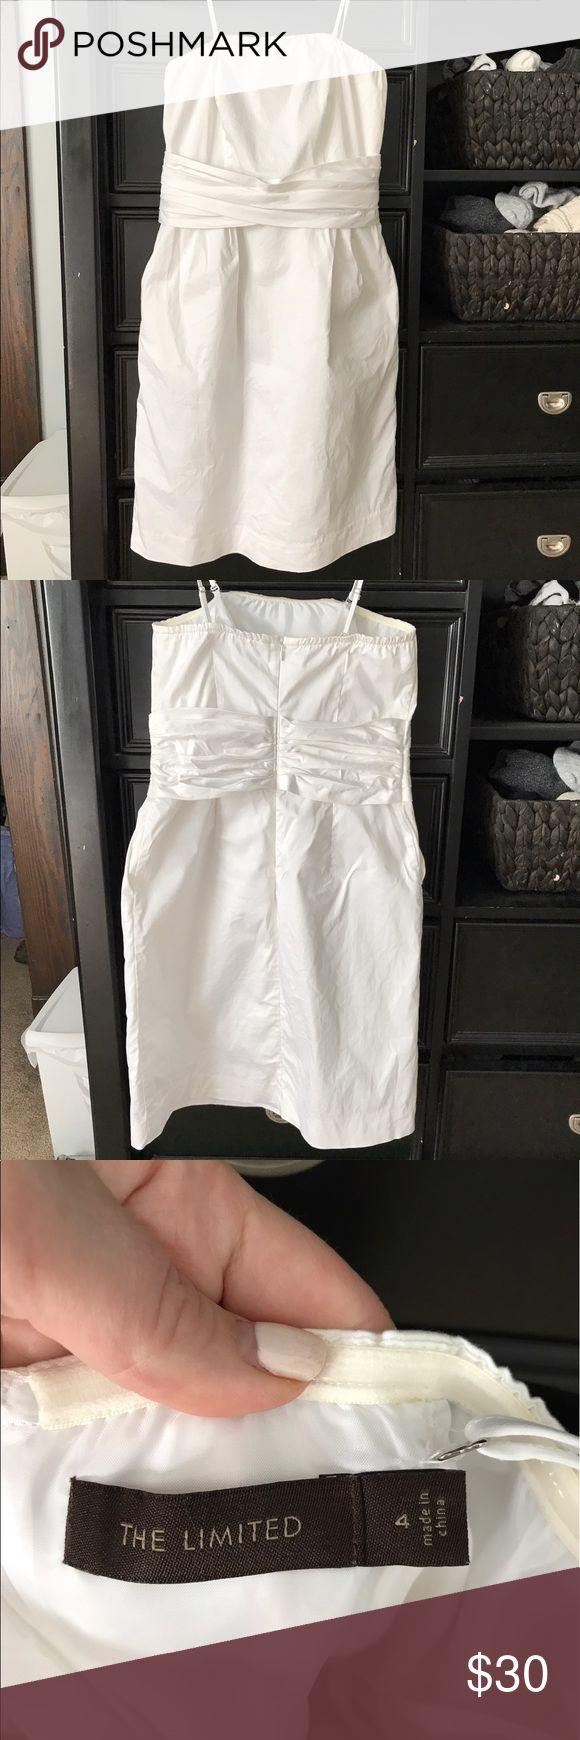 25 best bridal undergarments ideas on pinterest wedding for Wedding dresses that make you look skinny